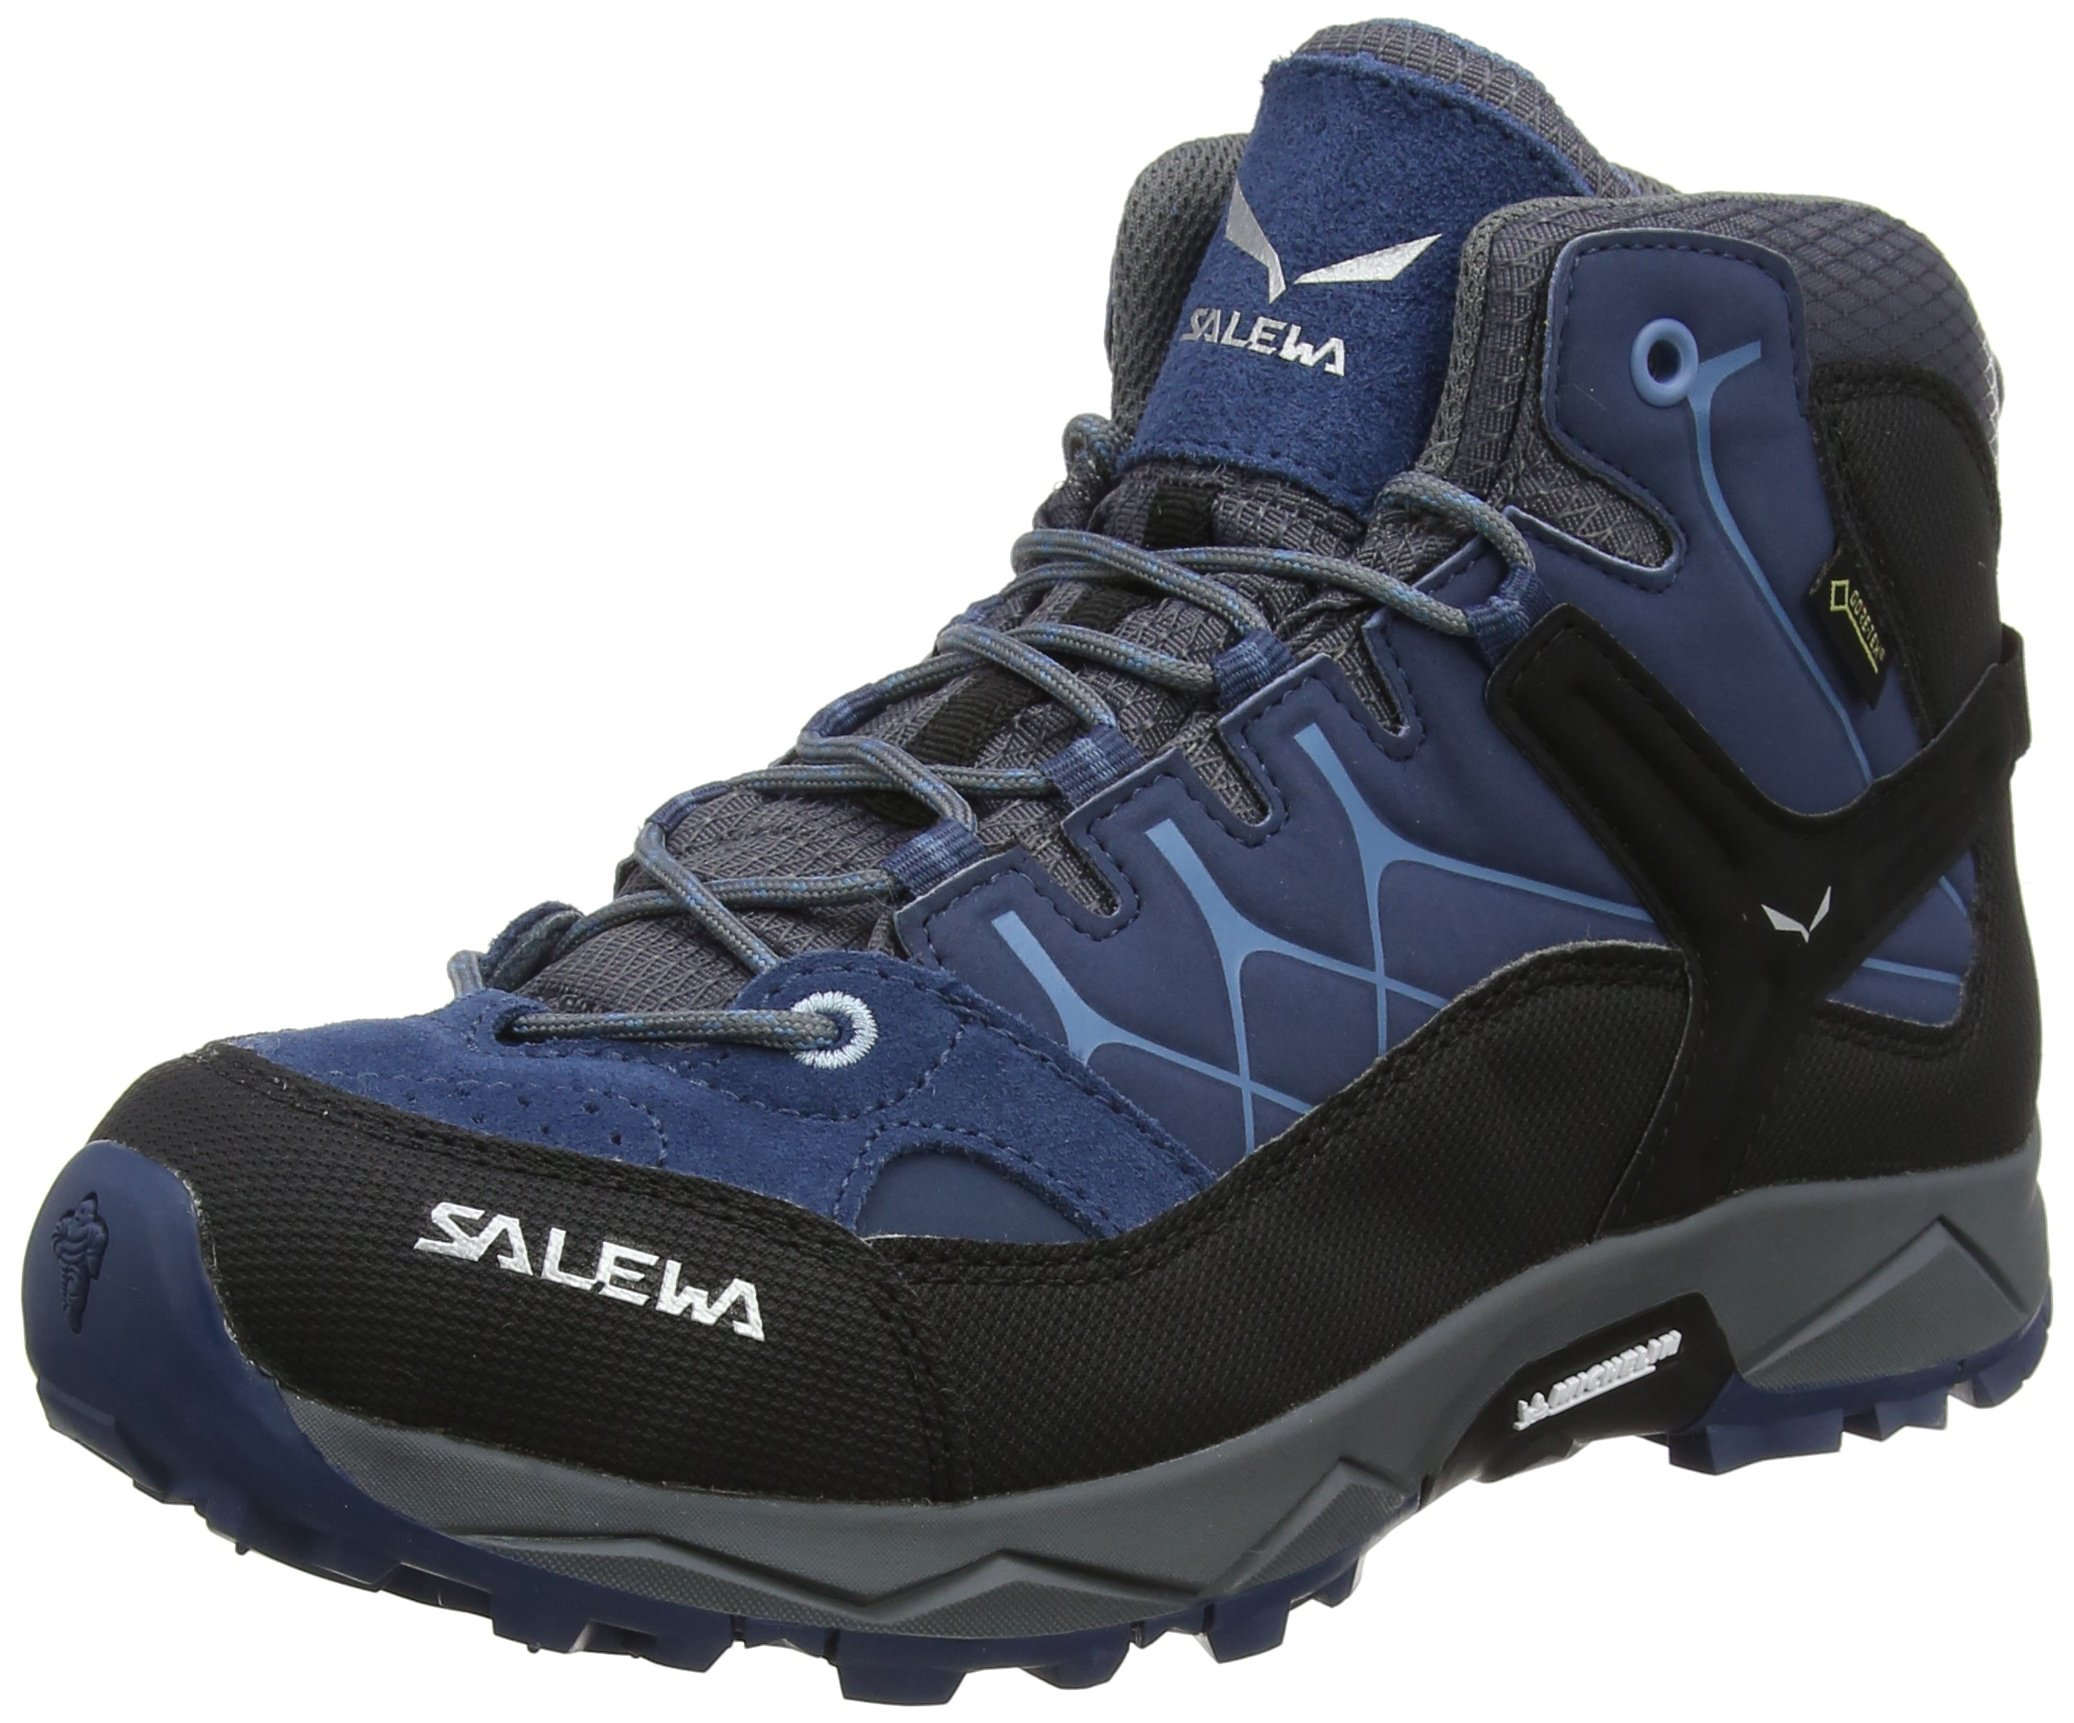 Salewa JR Alp Trainer Mid Gore-TEX Trekking- & Wanderstiefel, Dark Denim/Charcoa